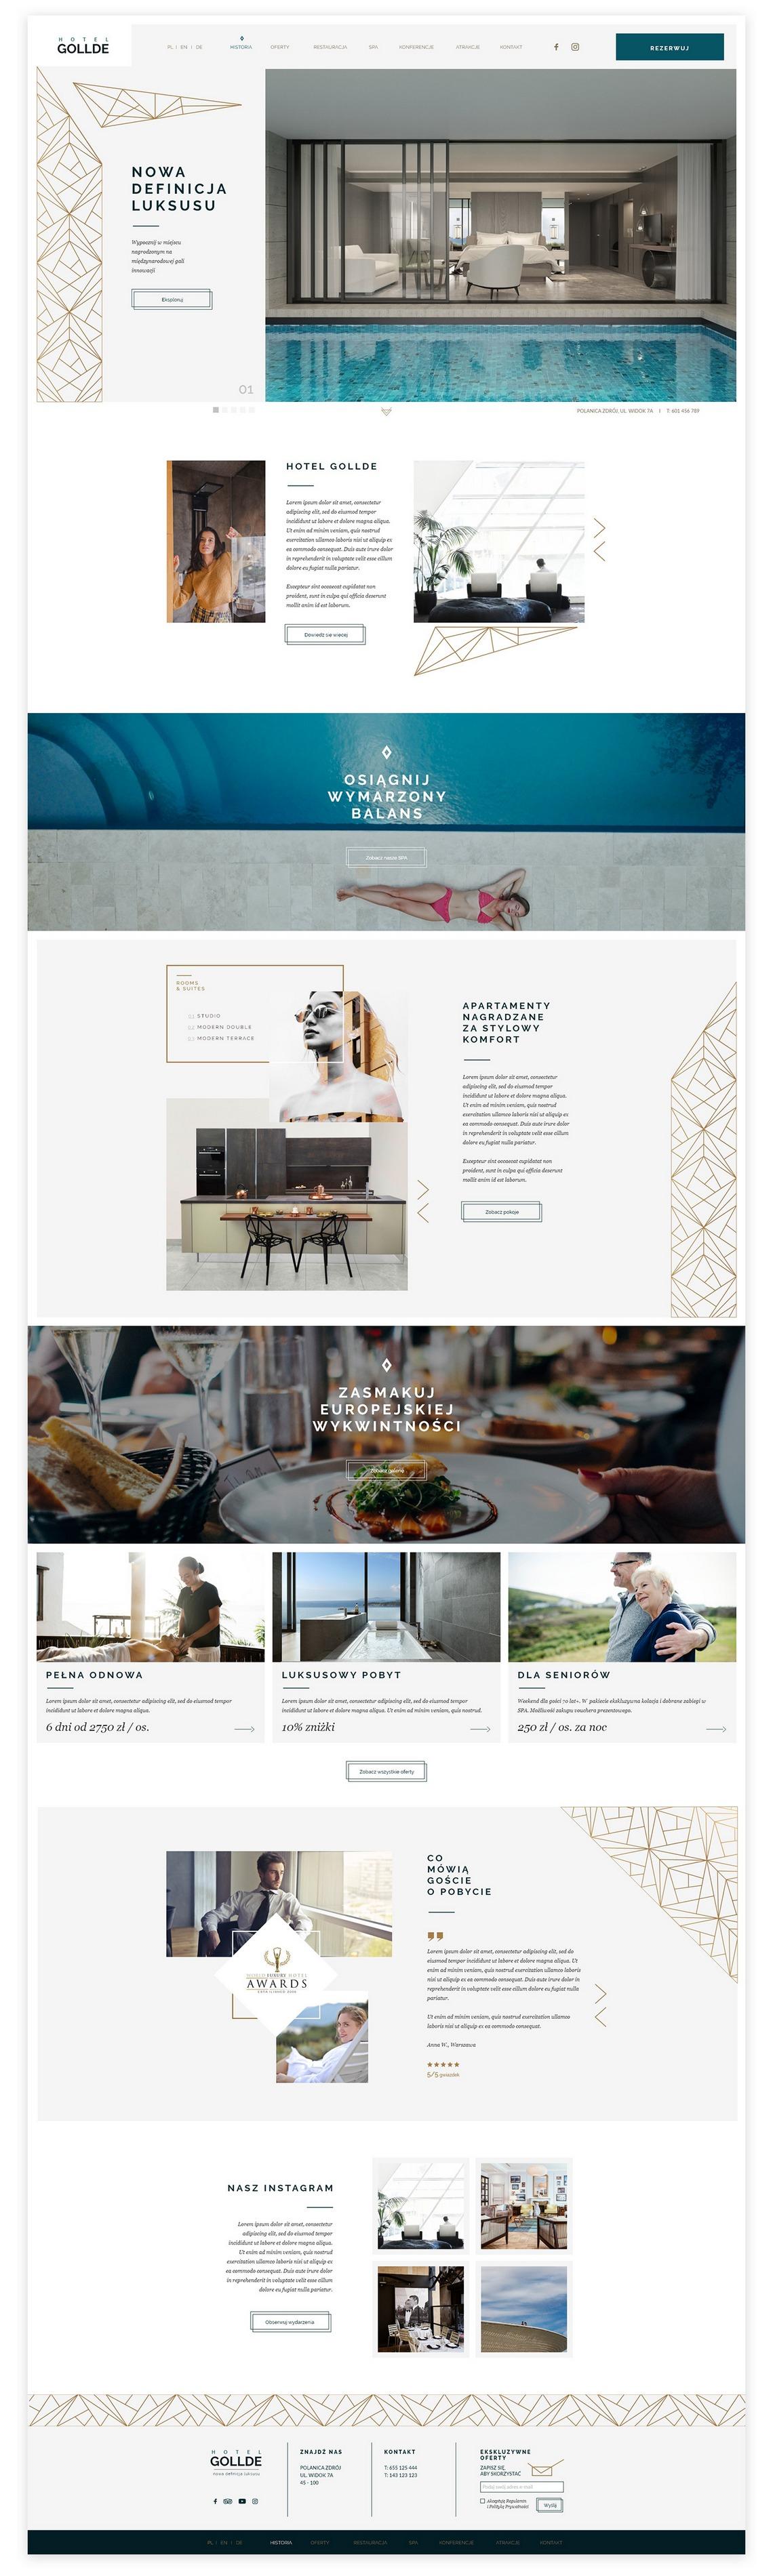 Hotel Gollde Elegant Template WordPress